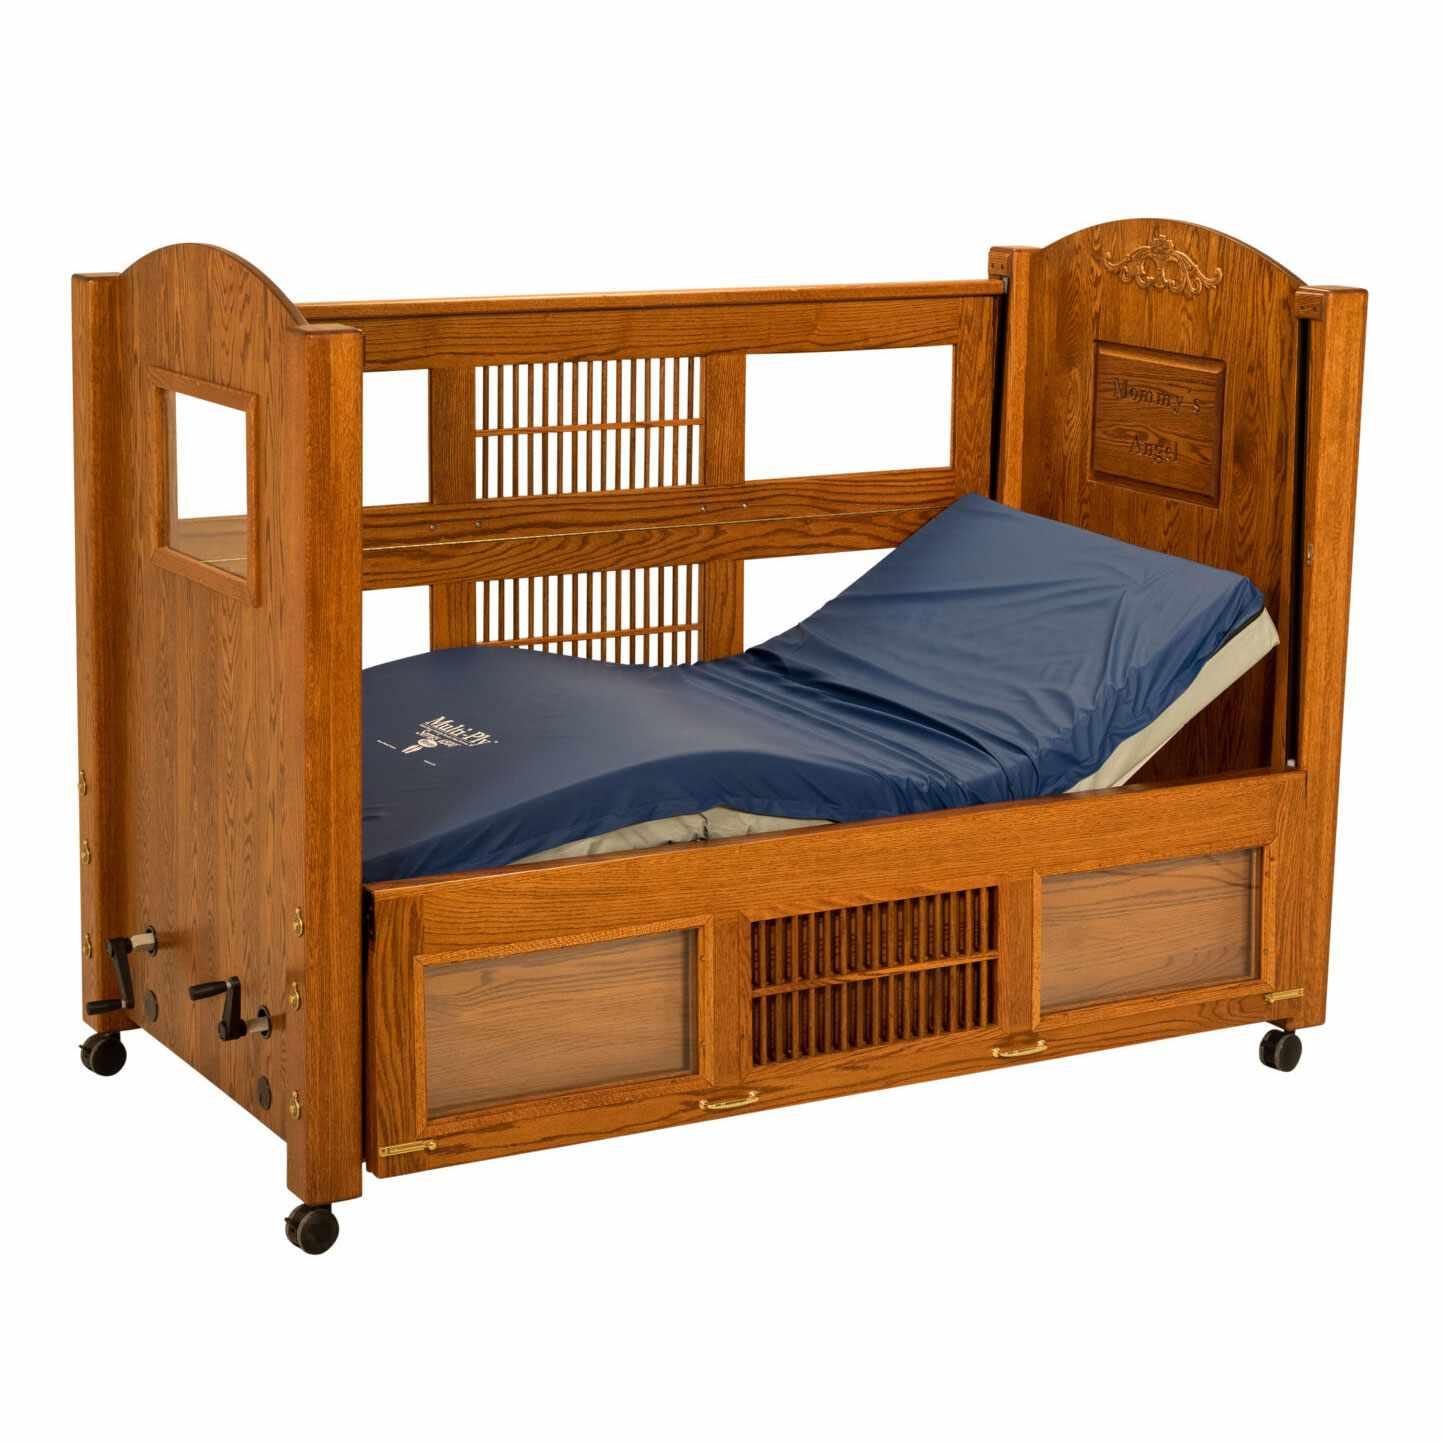 Dream series manual adjustable bed